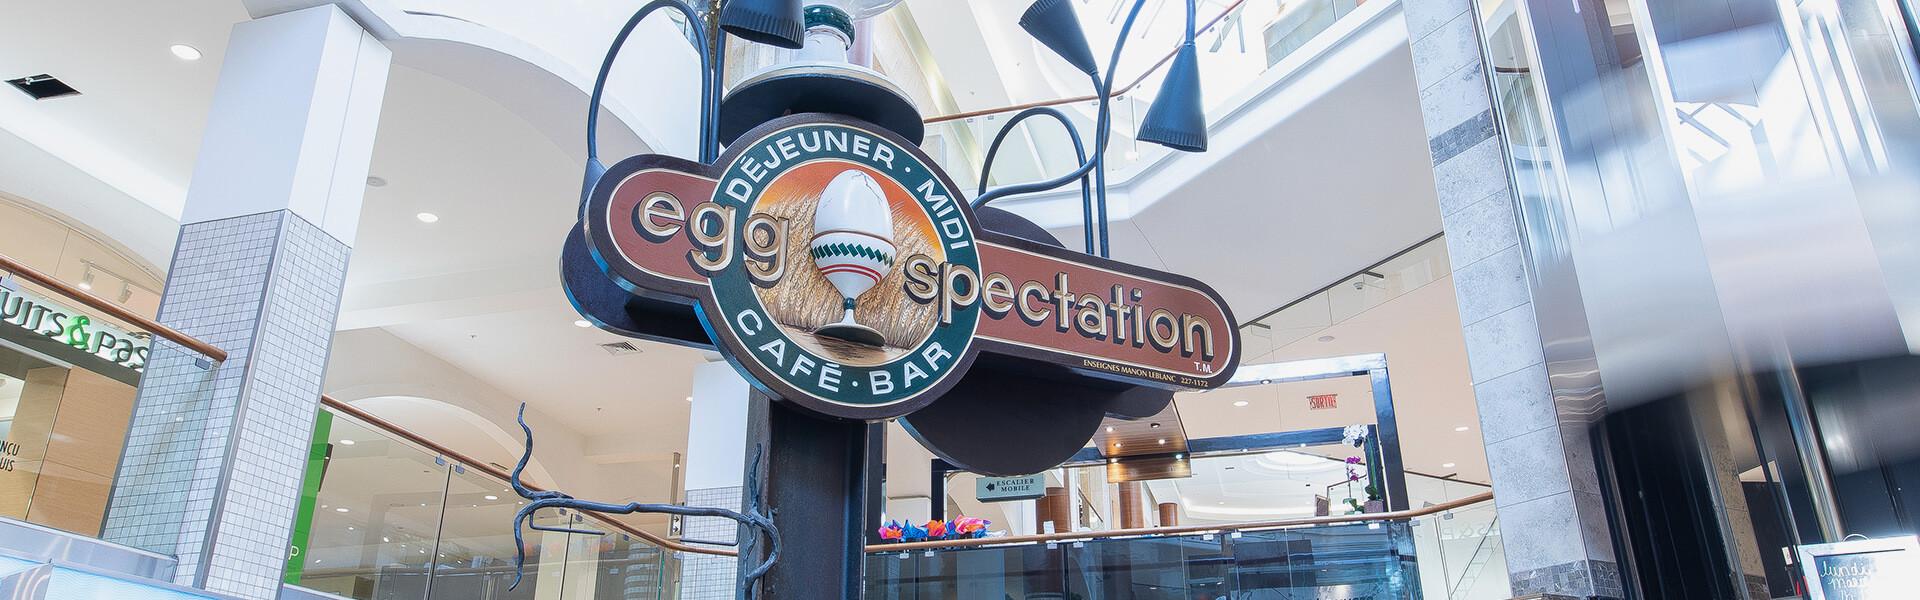 Eggspectation - Rockland